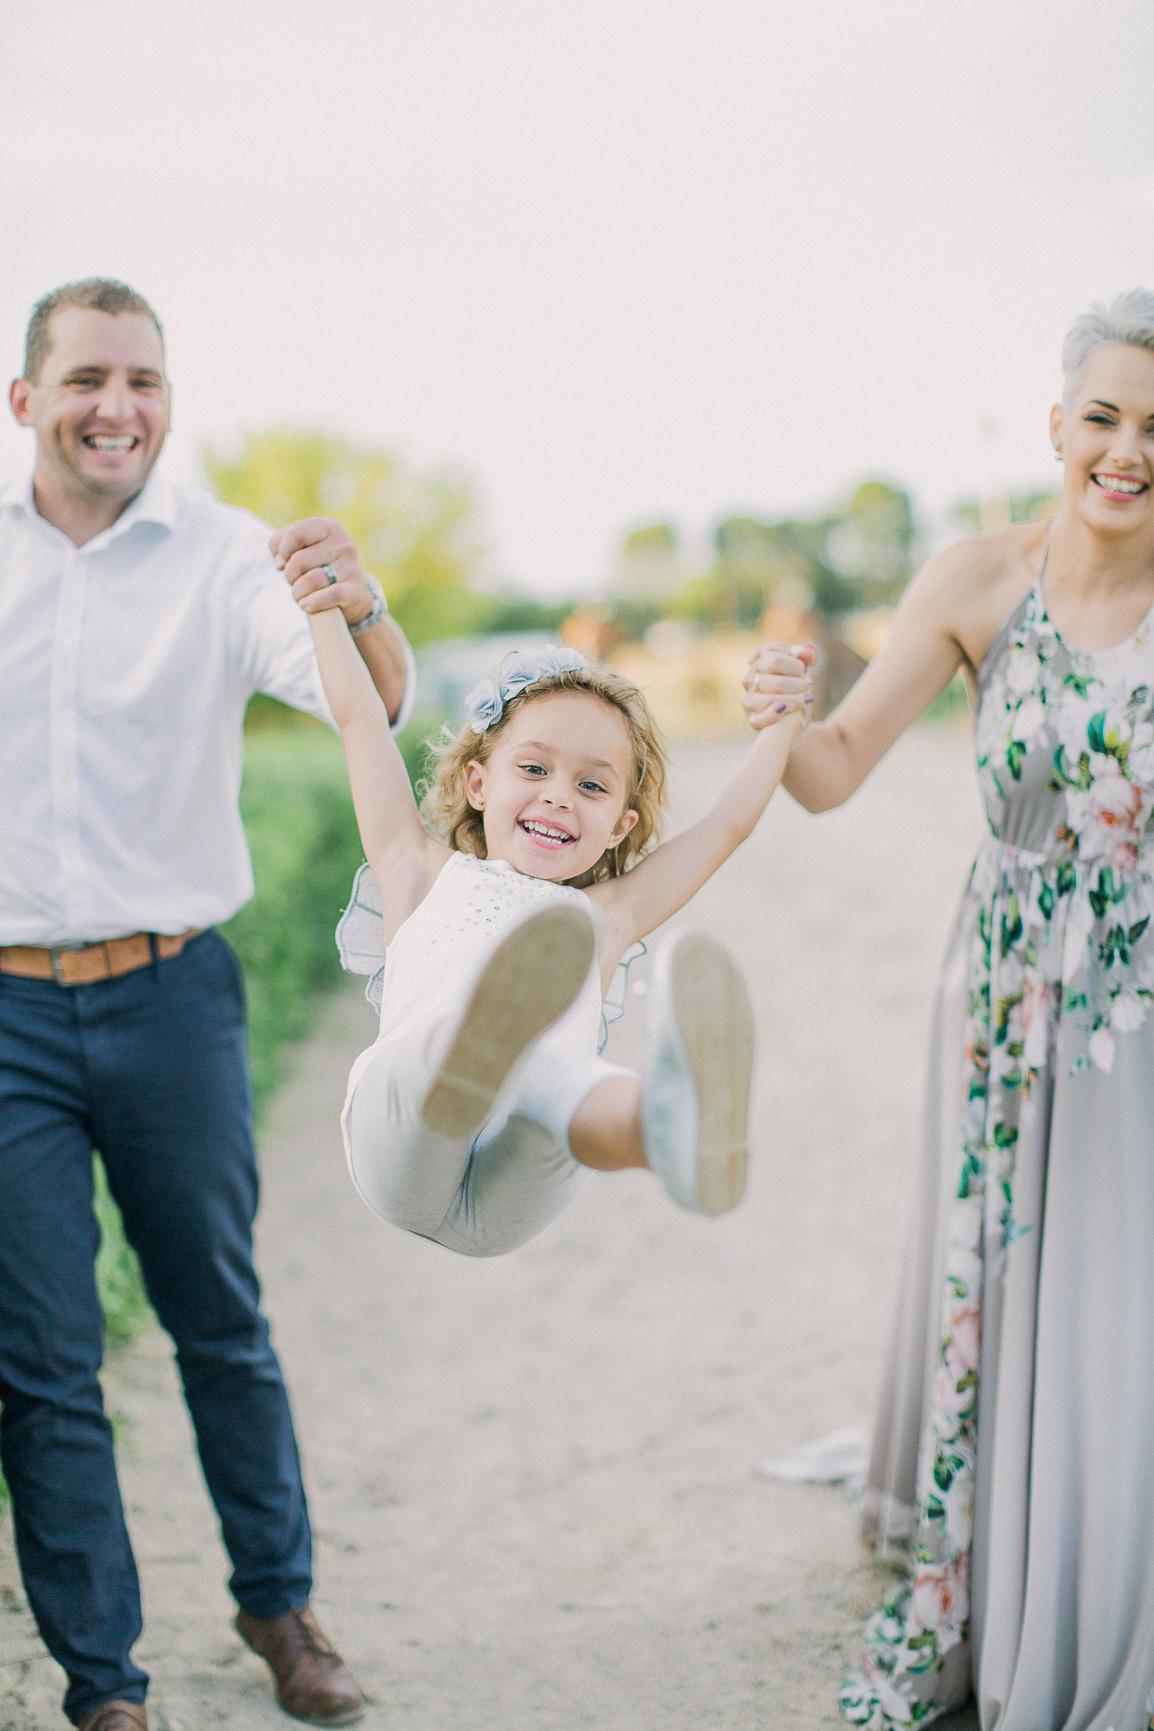 Hertford country hotel wedding photographer family019.jpg